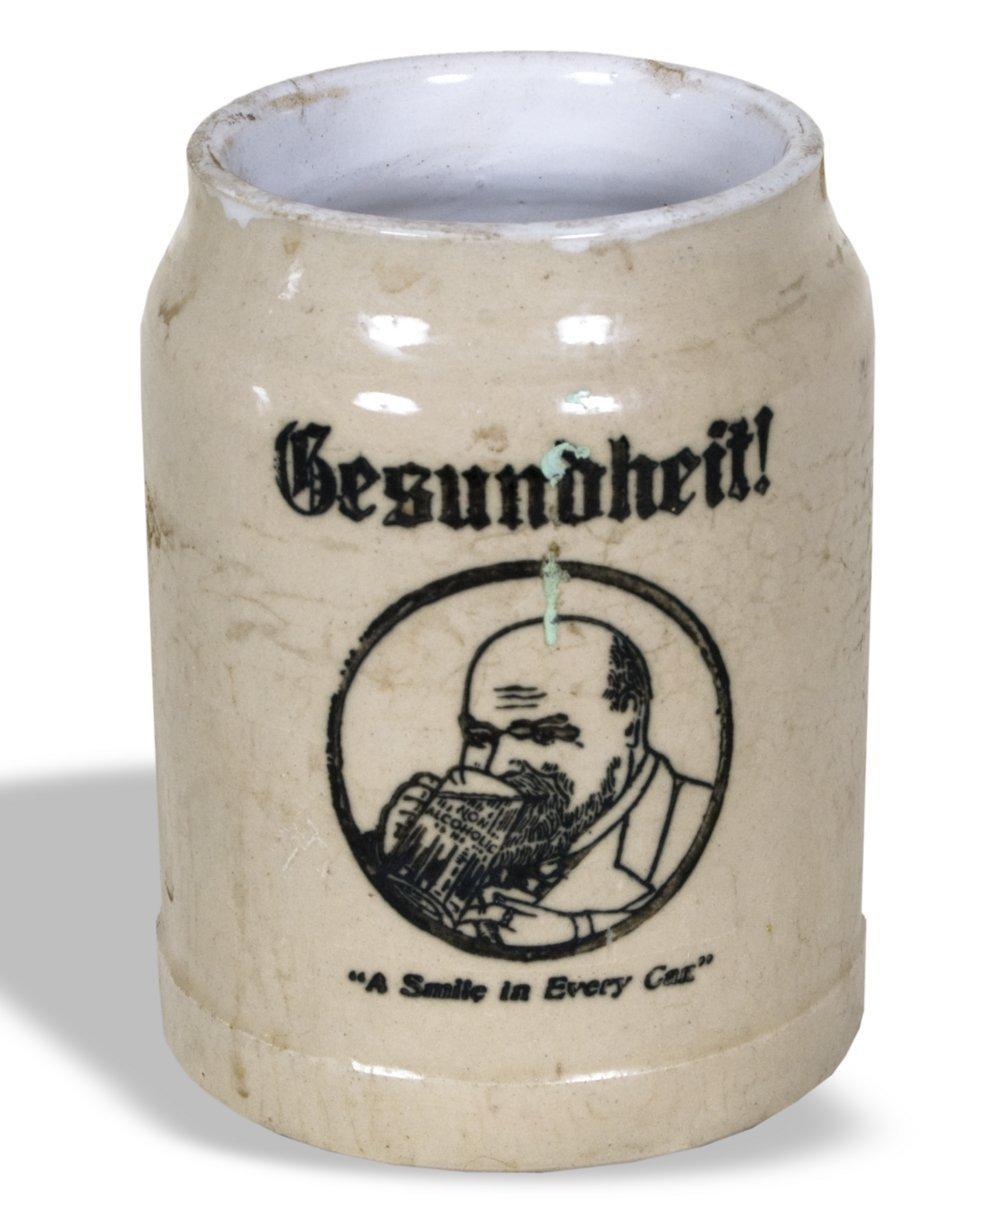 Gesundheit mug